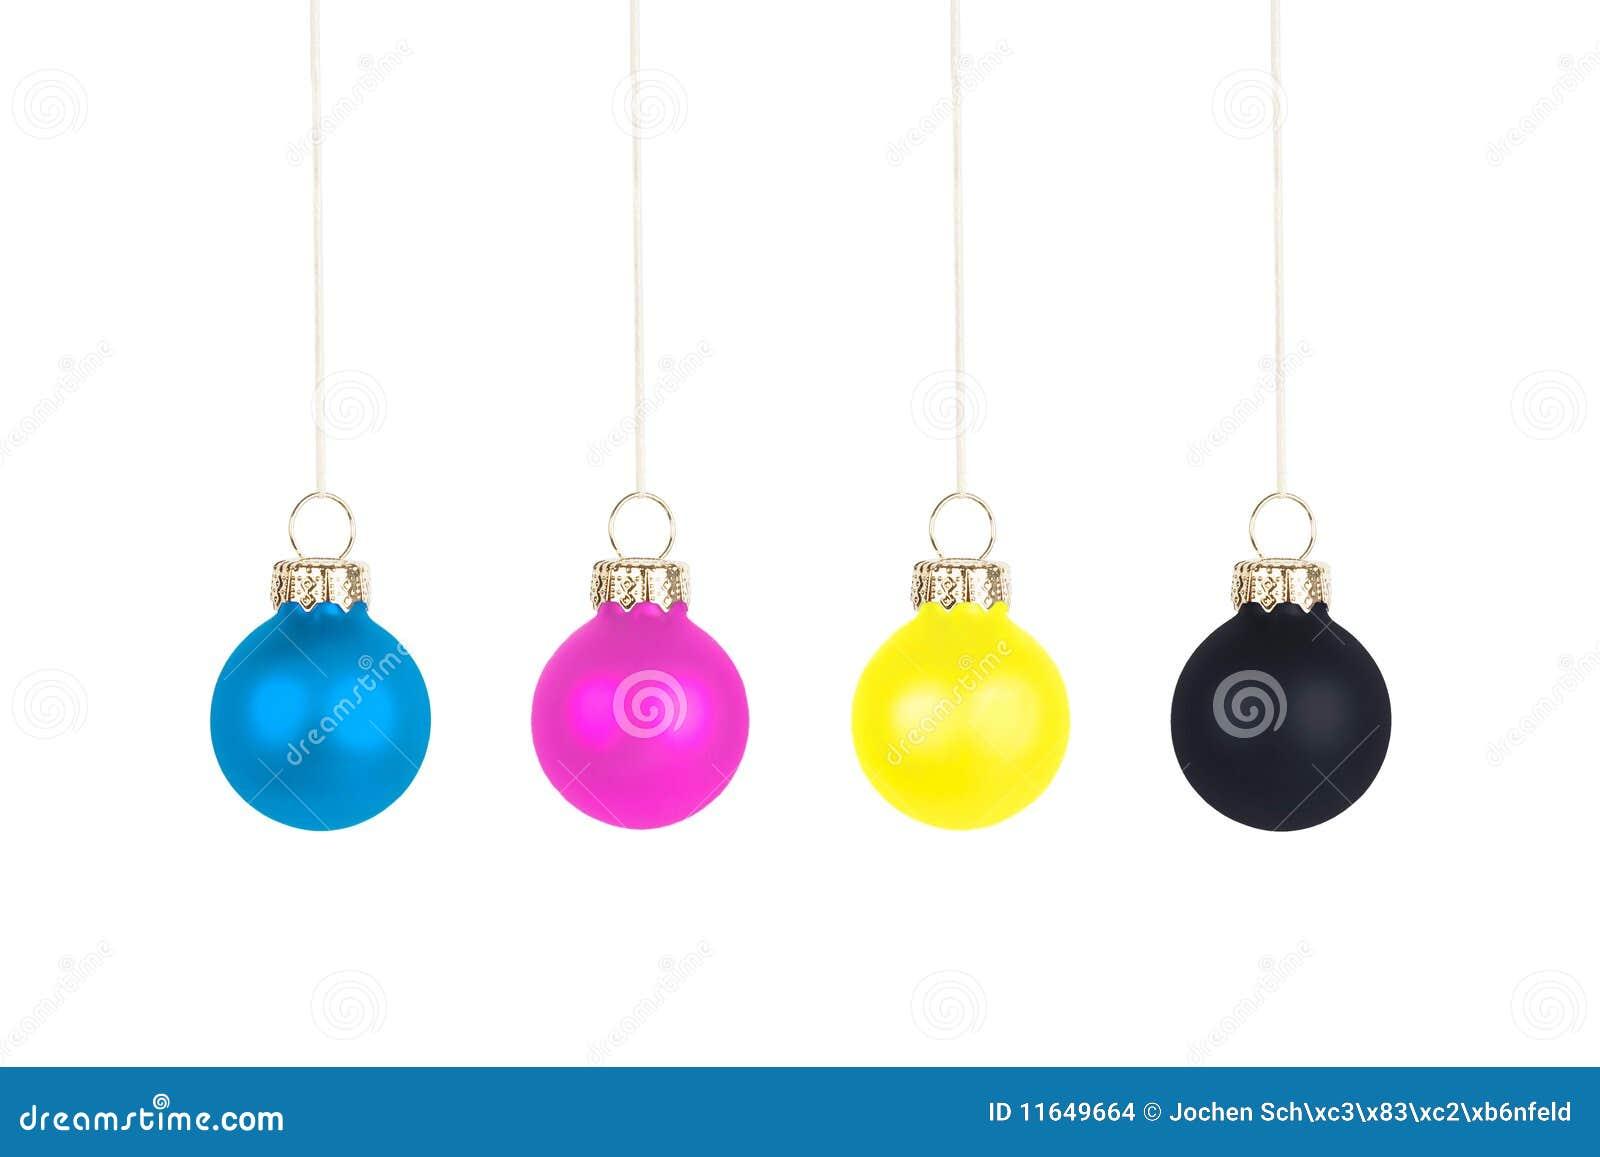 Christmas Tree Ball Placement : Christmas tree balls cmyk stock images image